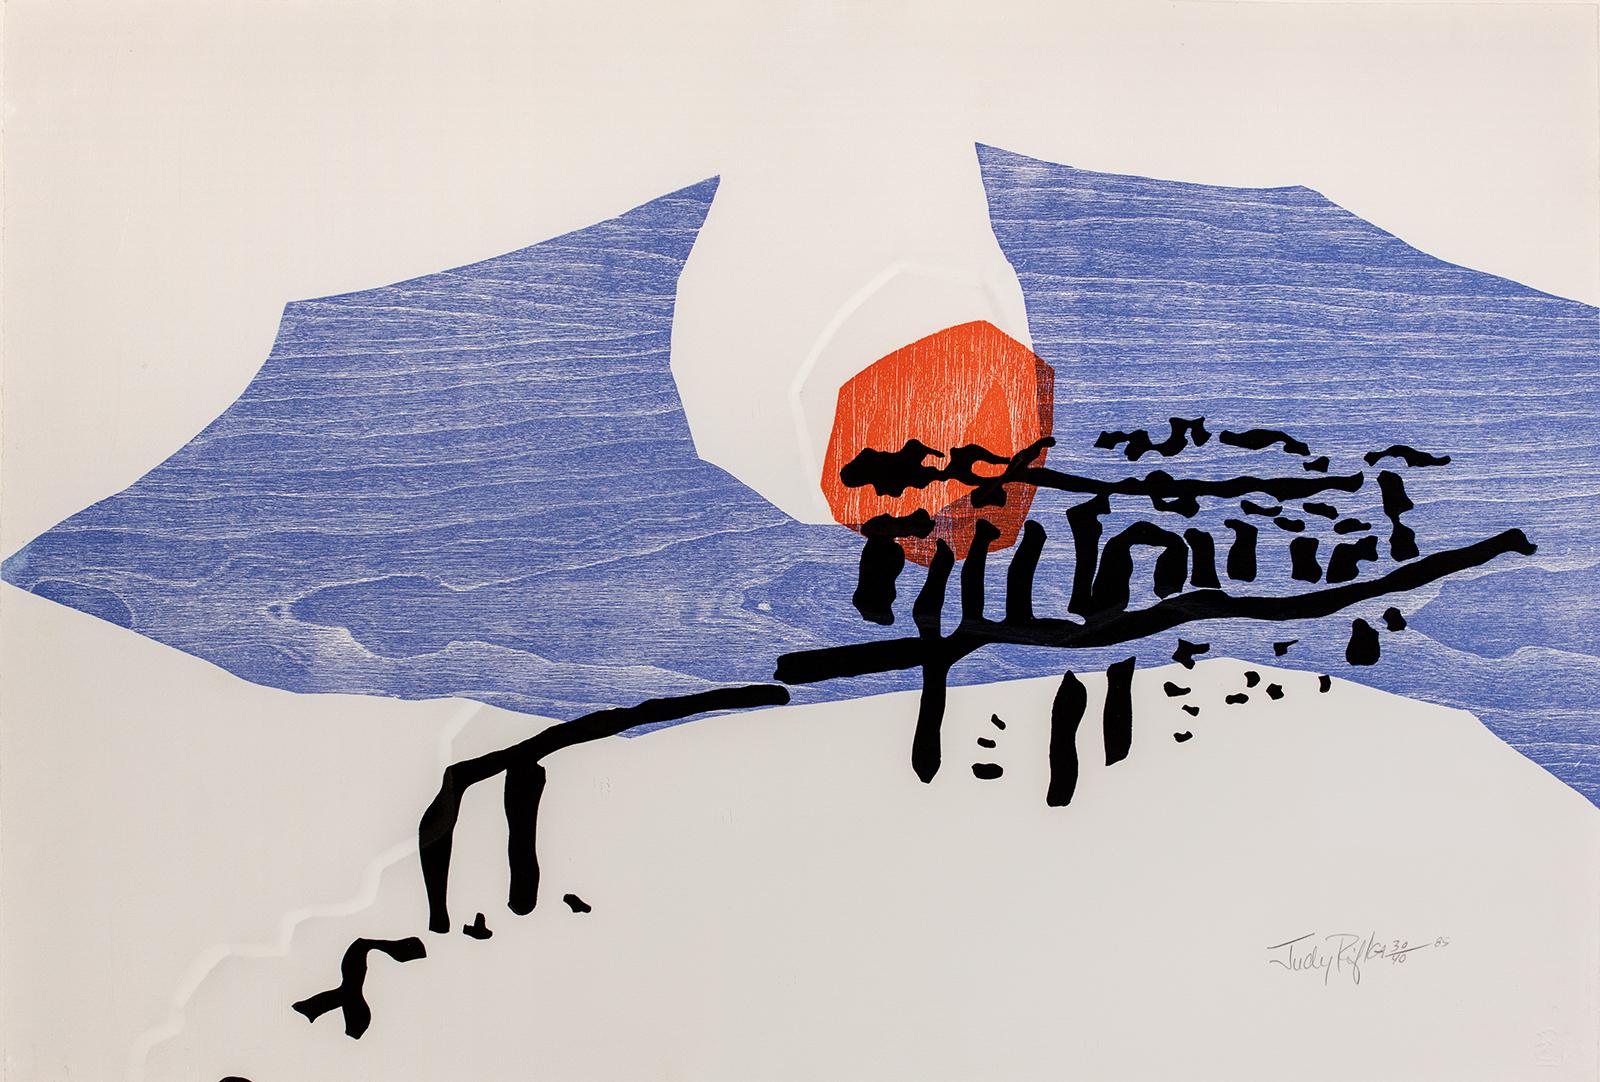 Judy Rifka, On Acropolis, 1985